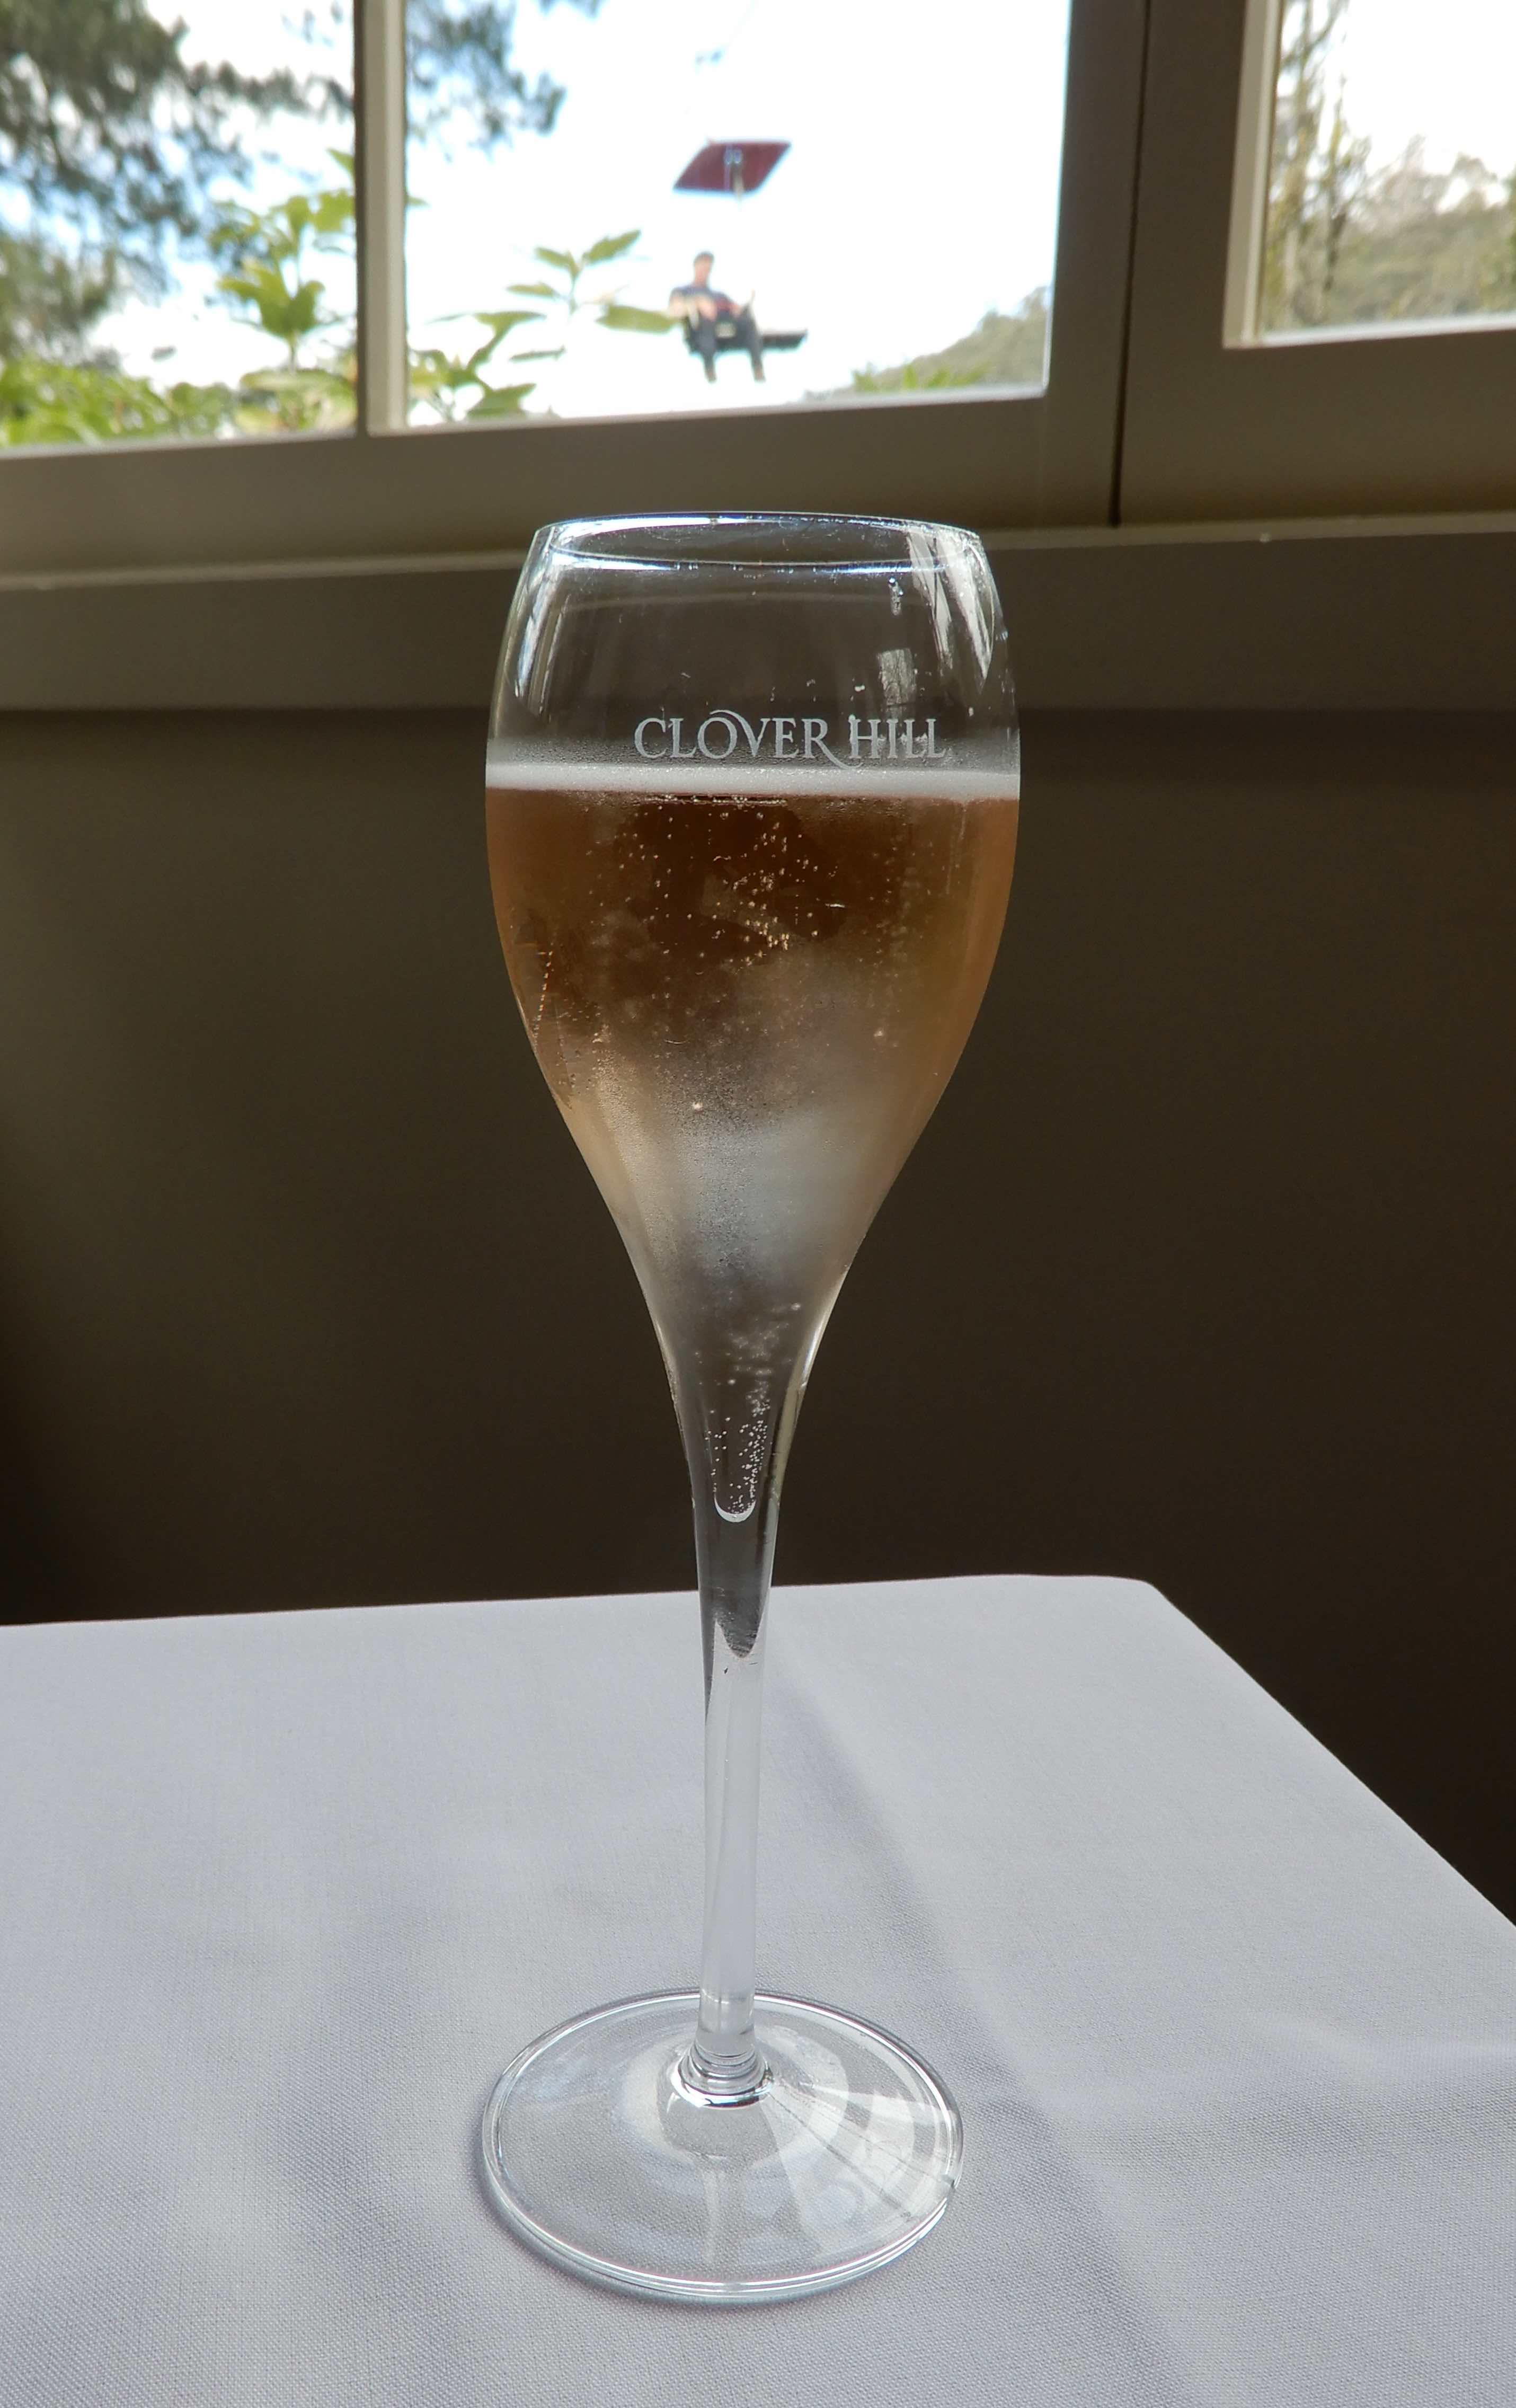 8.Clover Hill Non Vintage Rosè